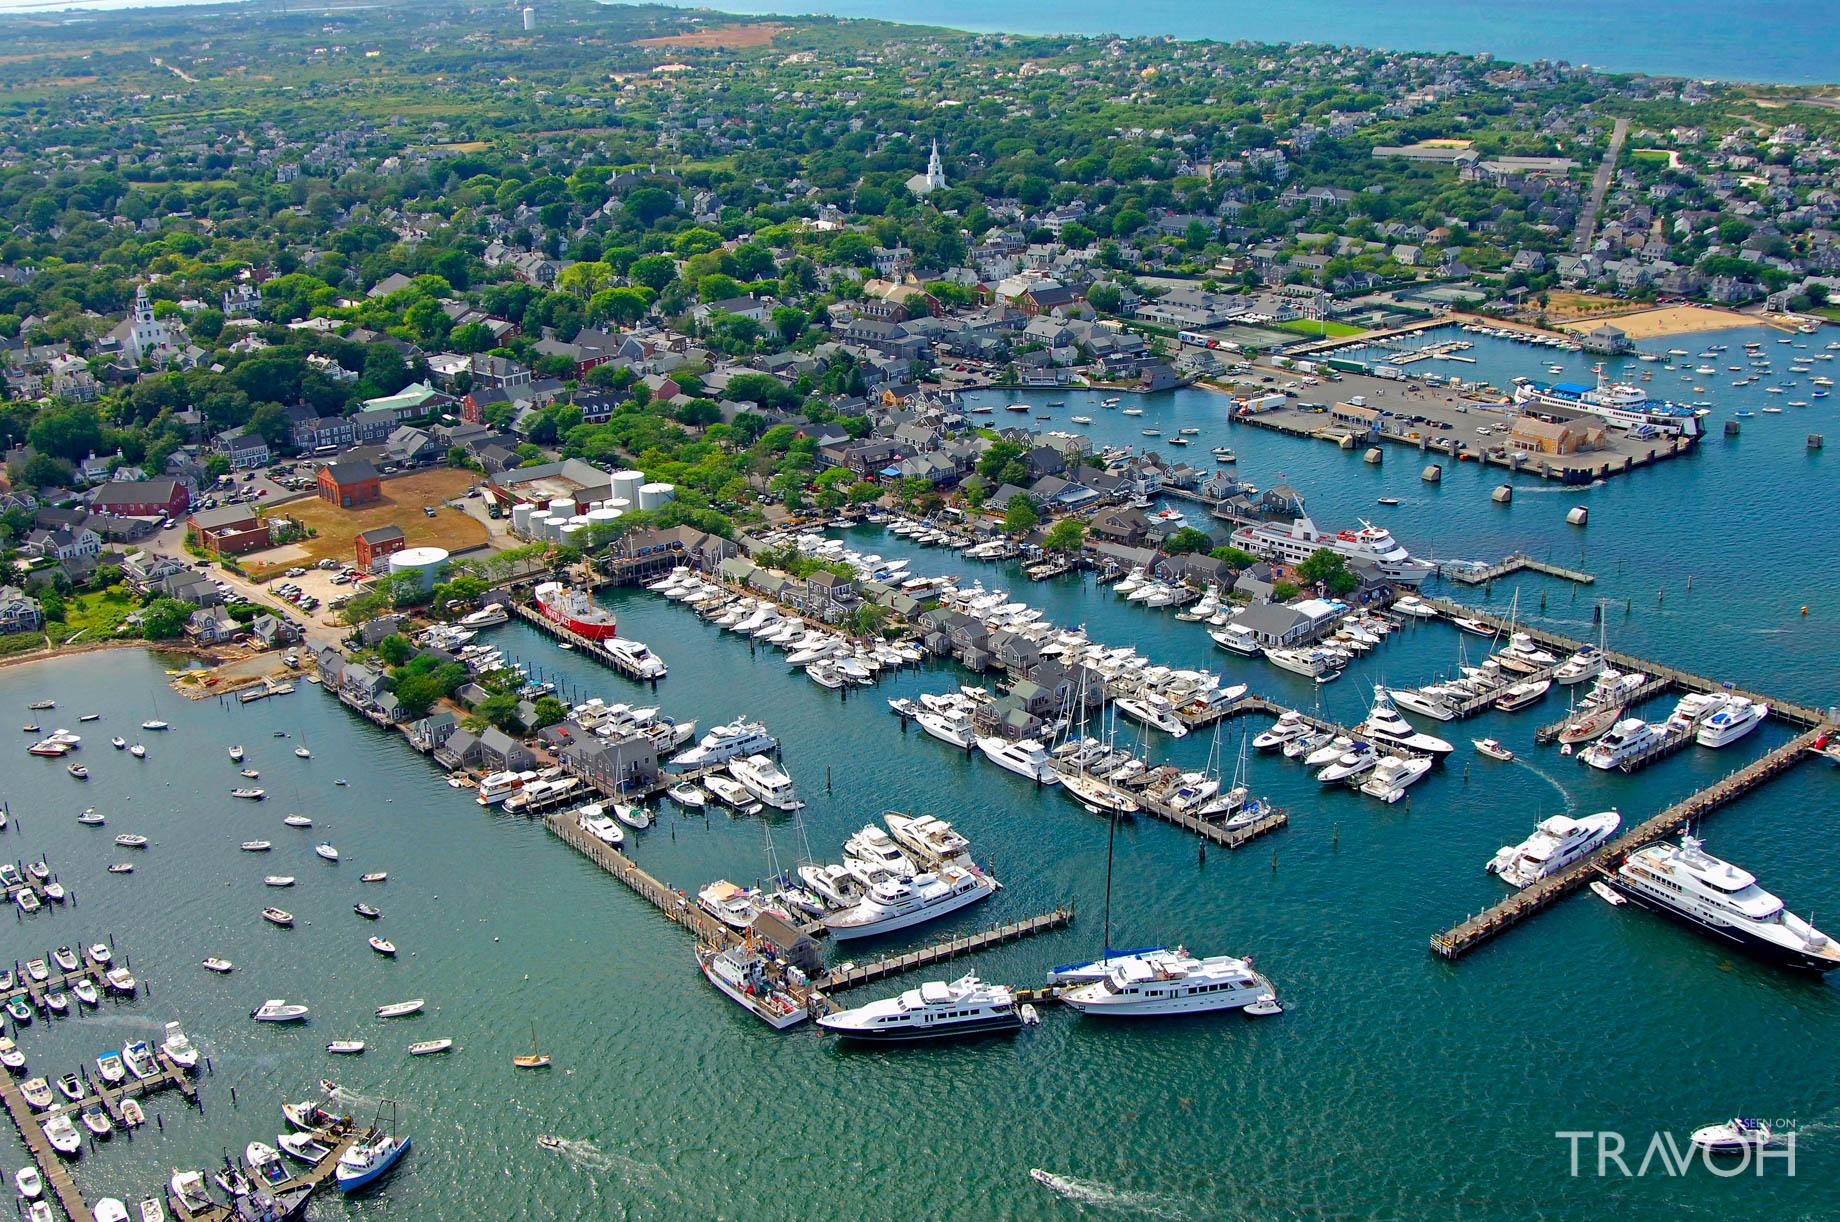 Nantucket - Massachusetts, USA